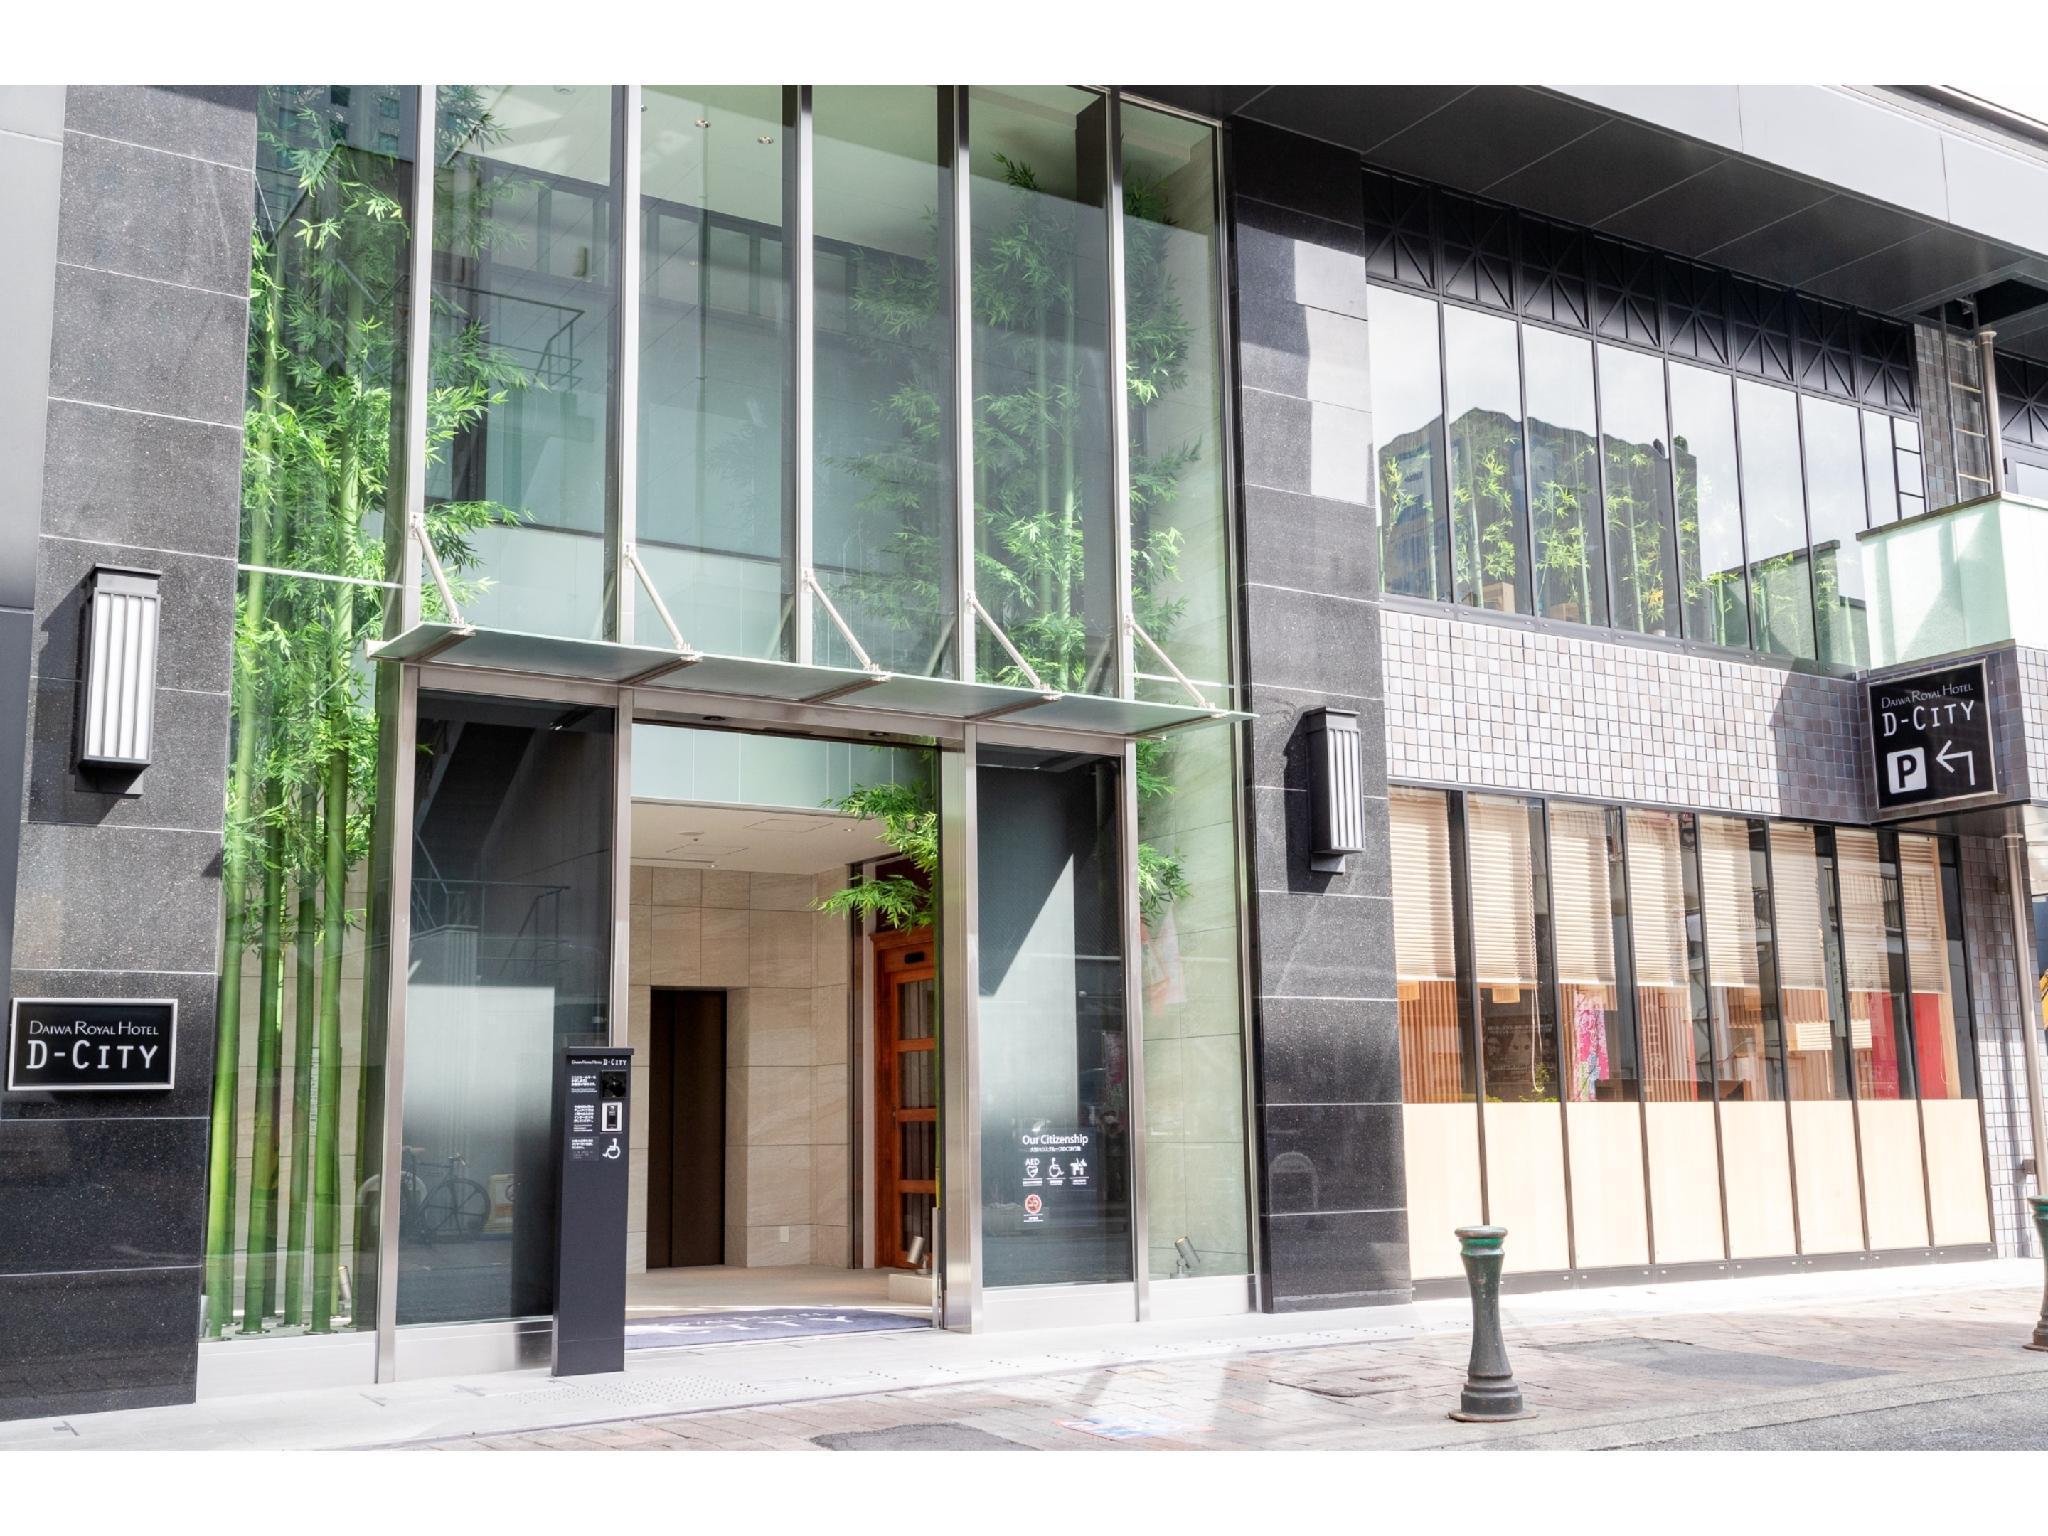 Daiwa Royal Hotel D City Nagoya Fushimi